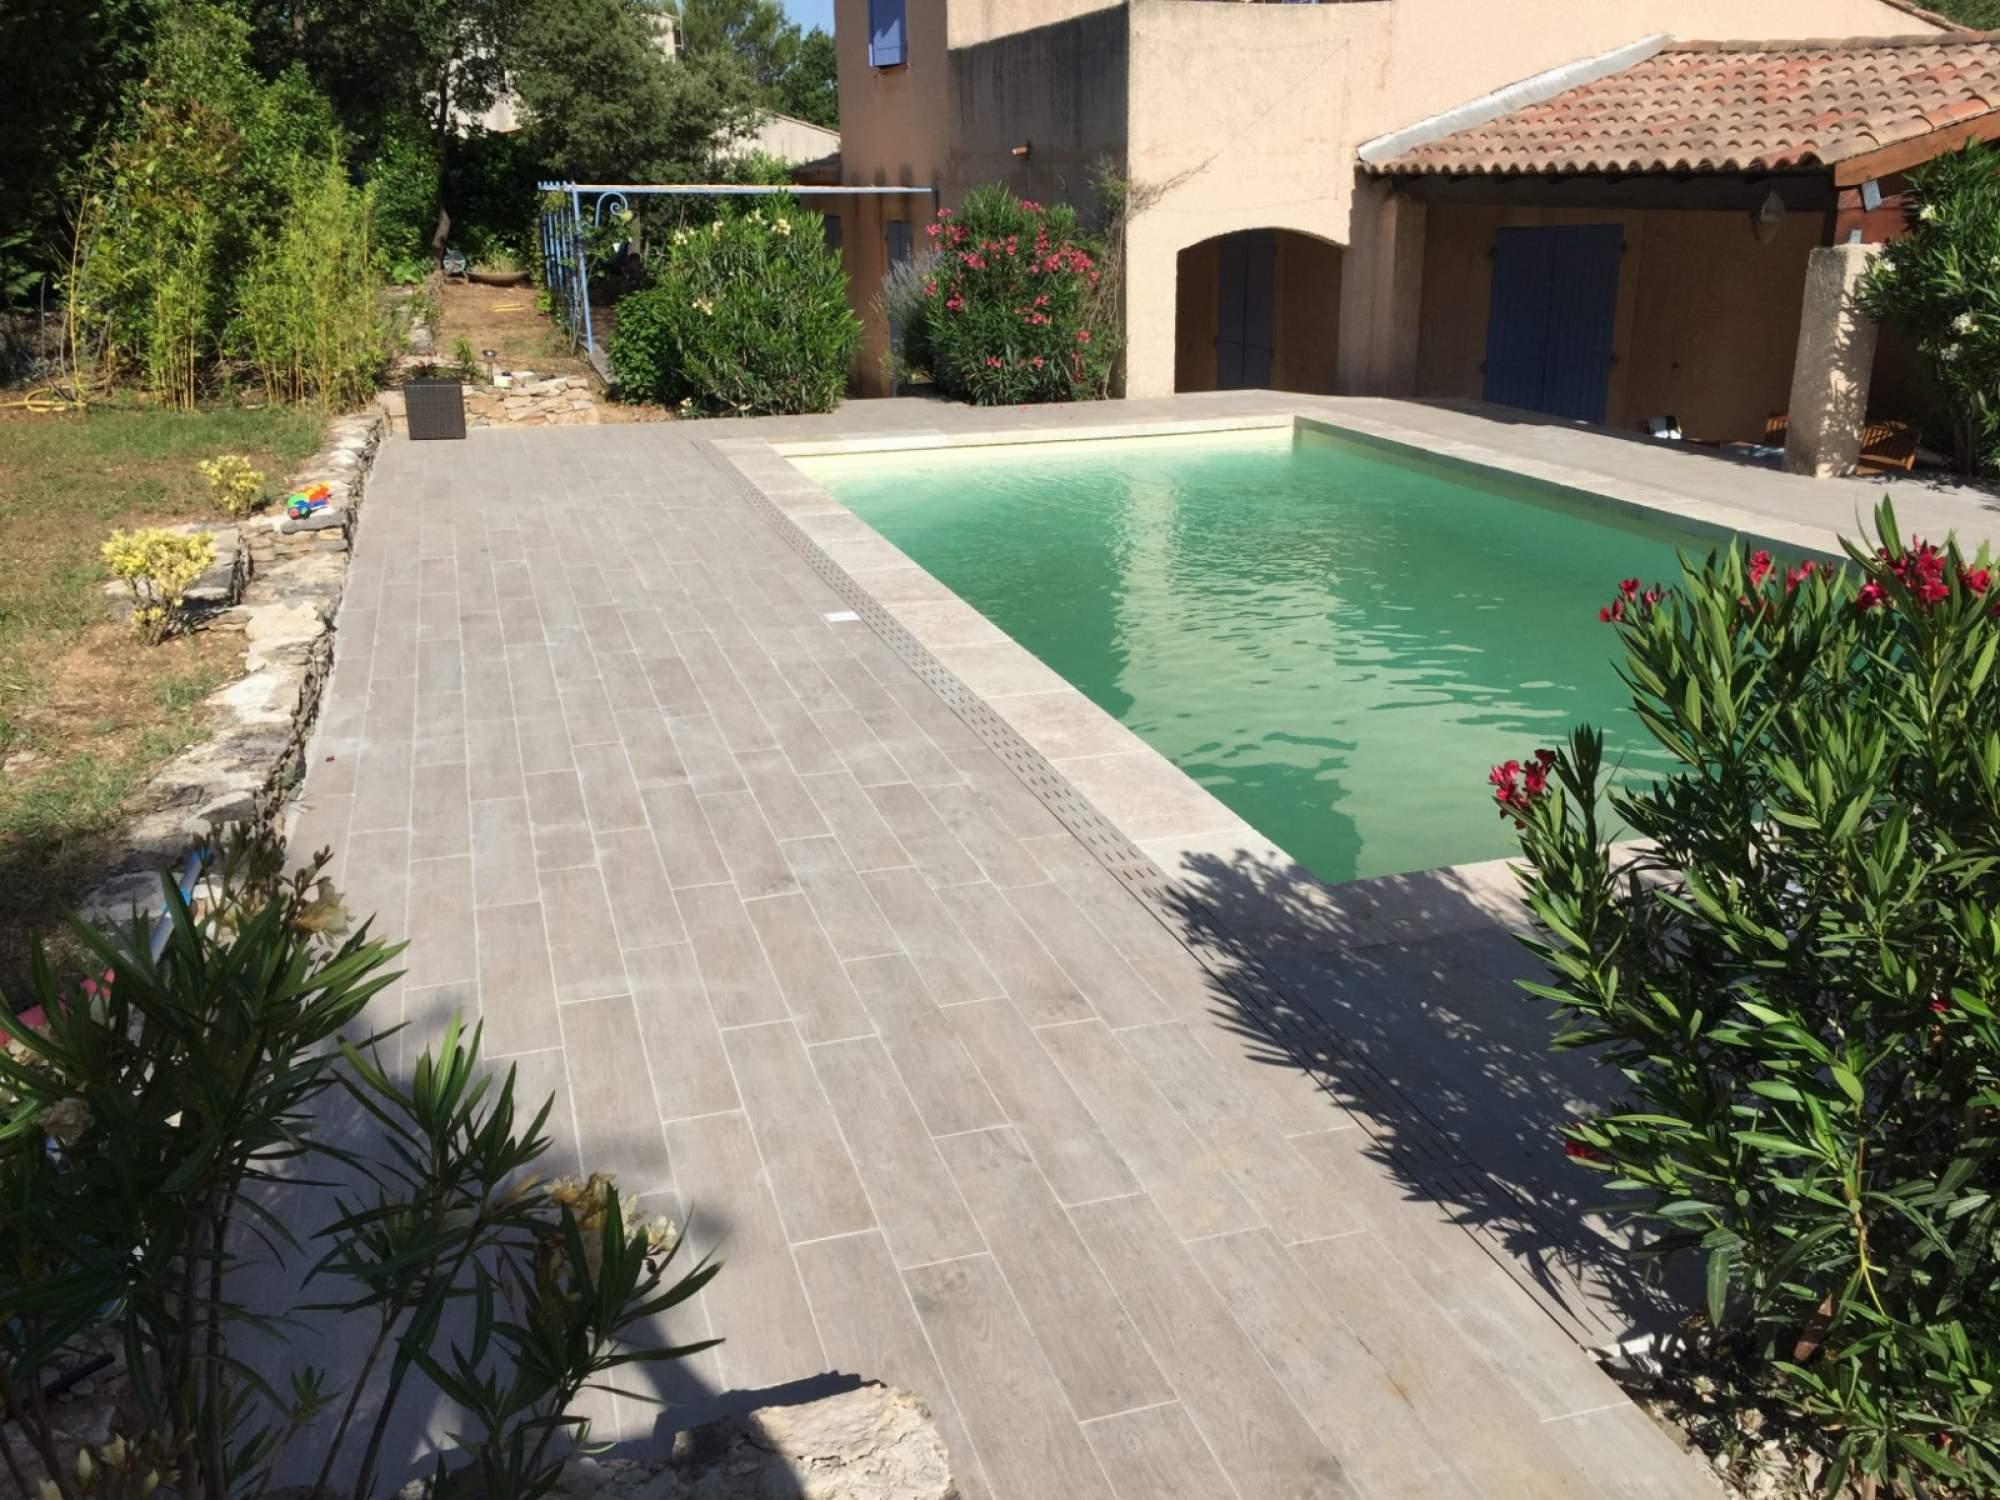 carrelage imitation bois pour terrasse piscine veranda. Black Bedroom Furniture Sets. Home Design Ideas